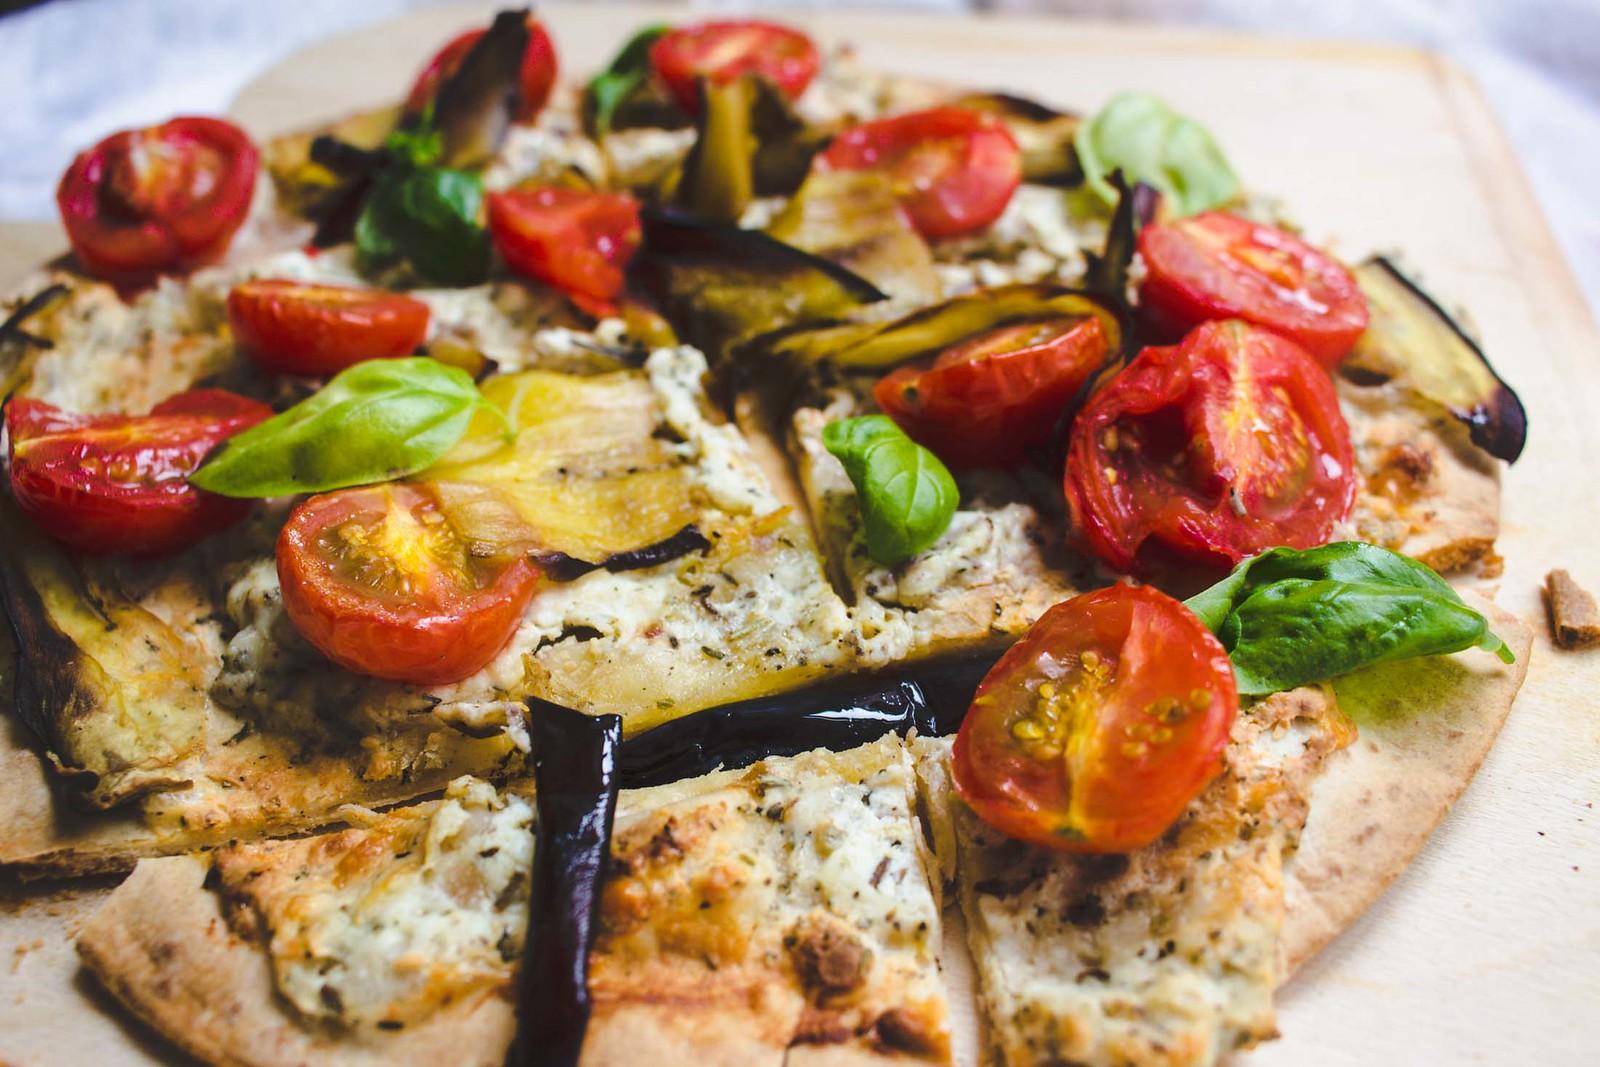 geschummelter flammkuchen mit melanzani + tomaten